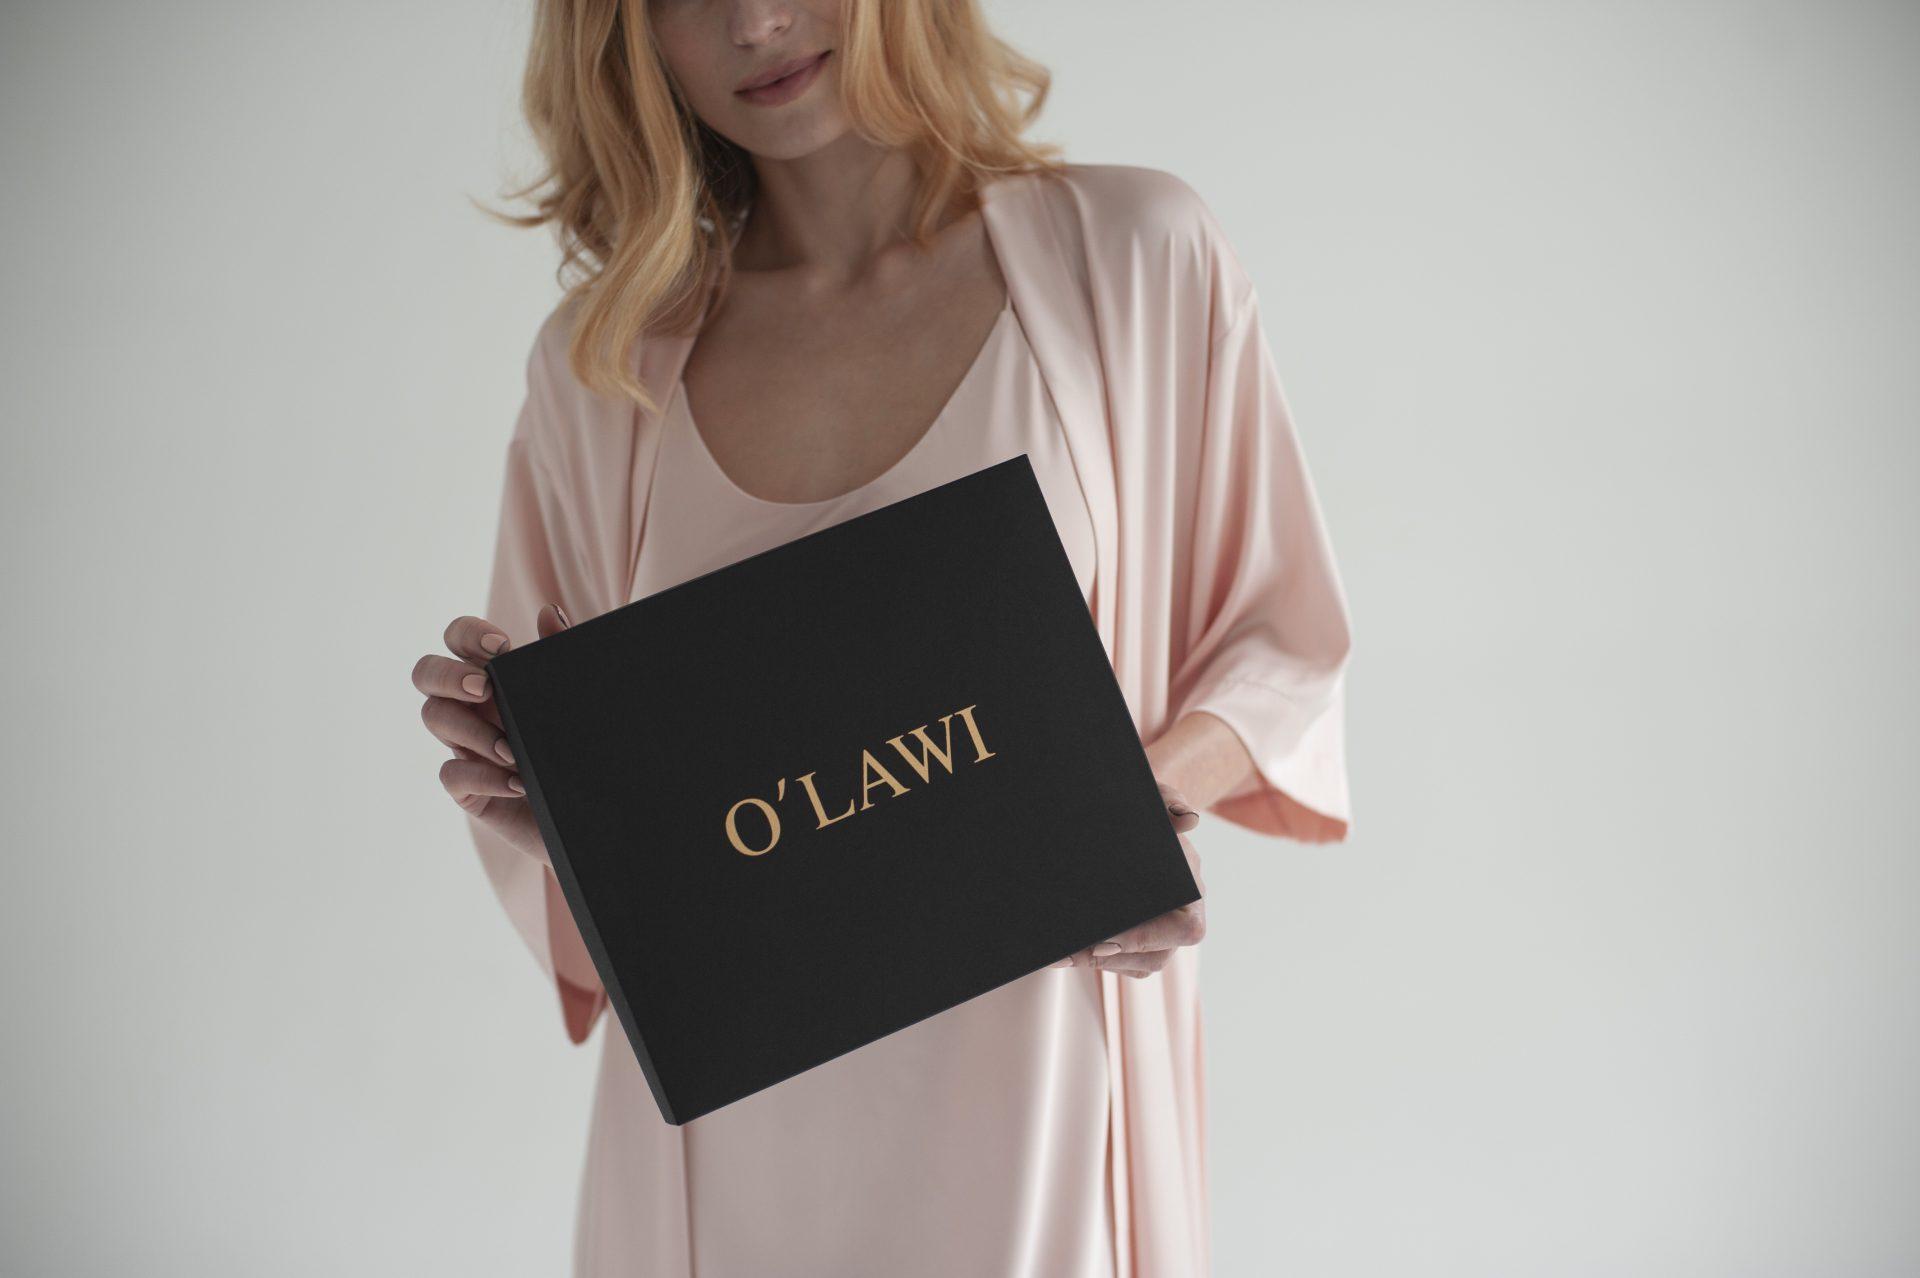 O'LAWI — Бренд домашней одежды